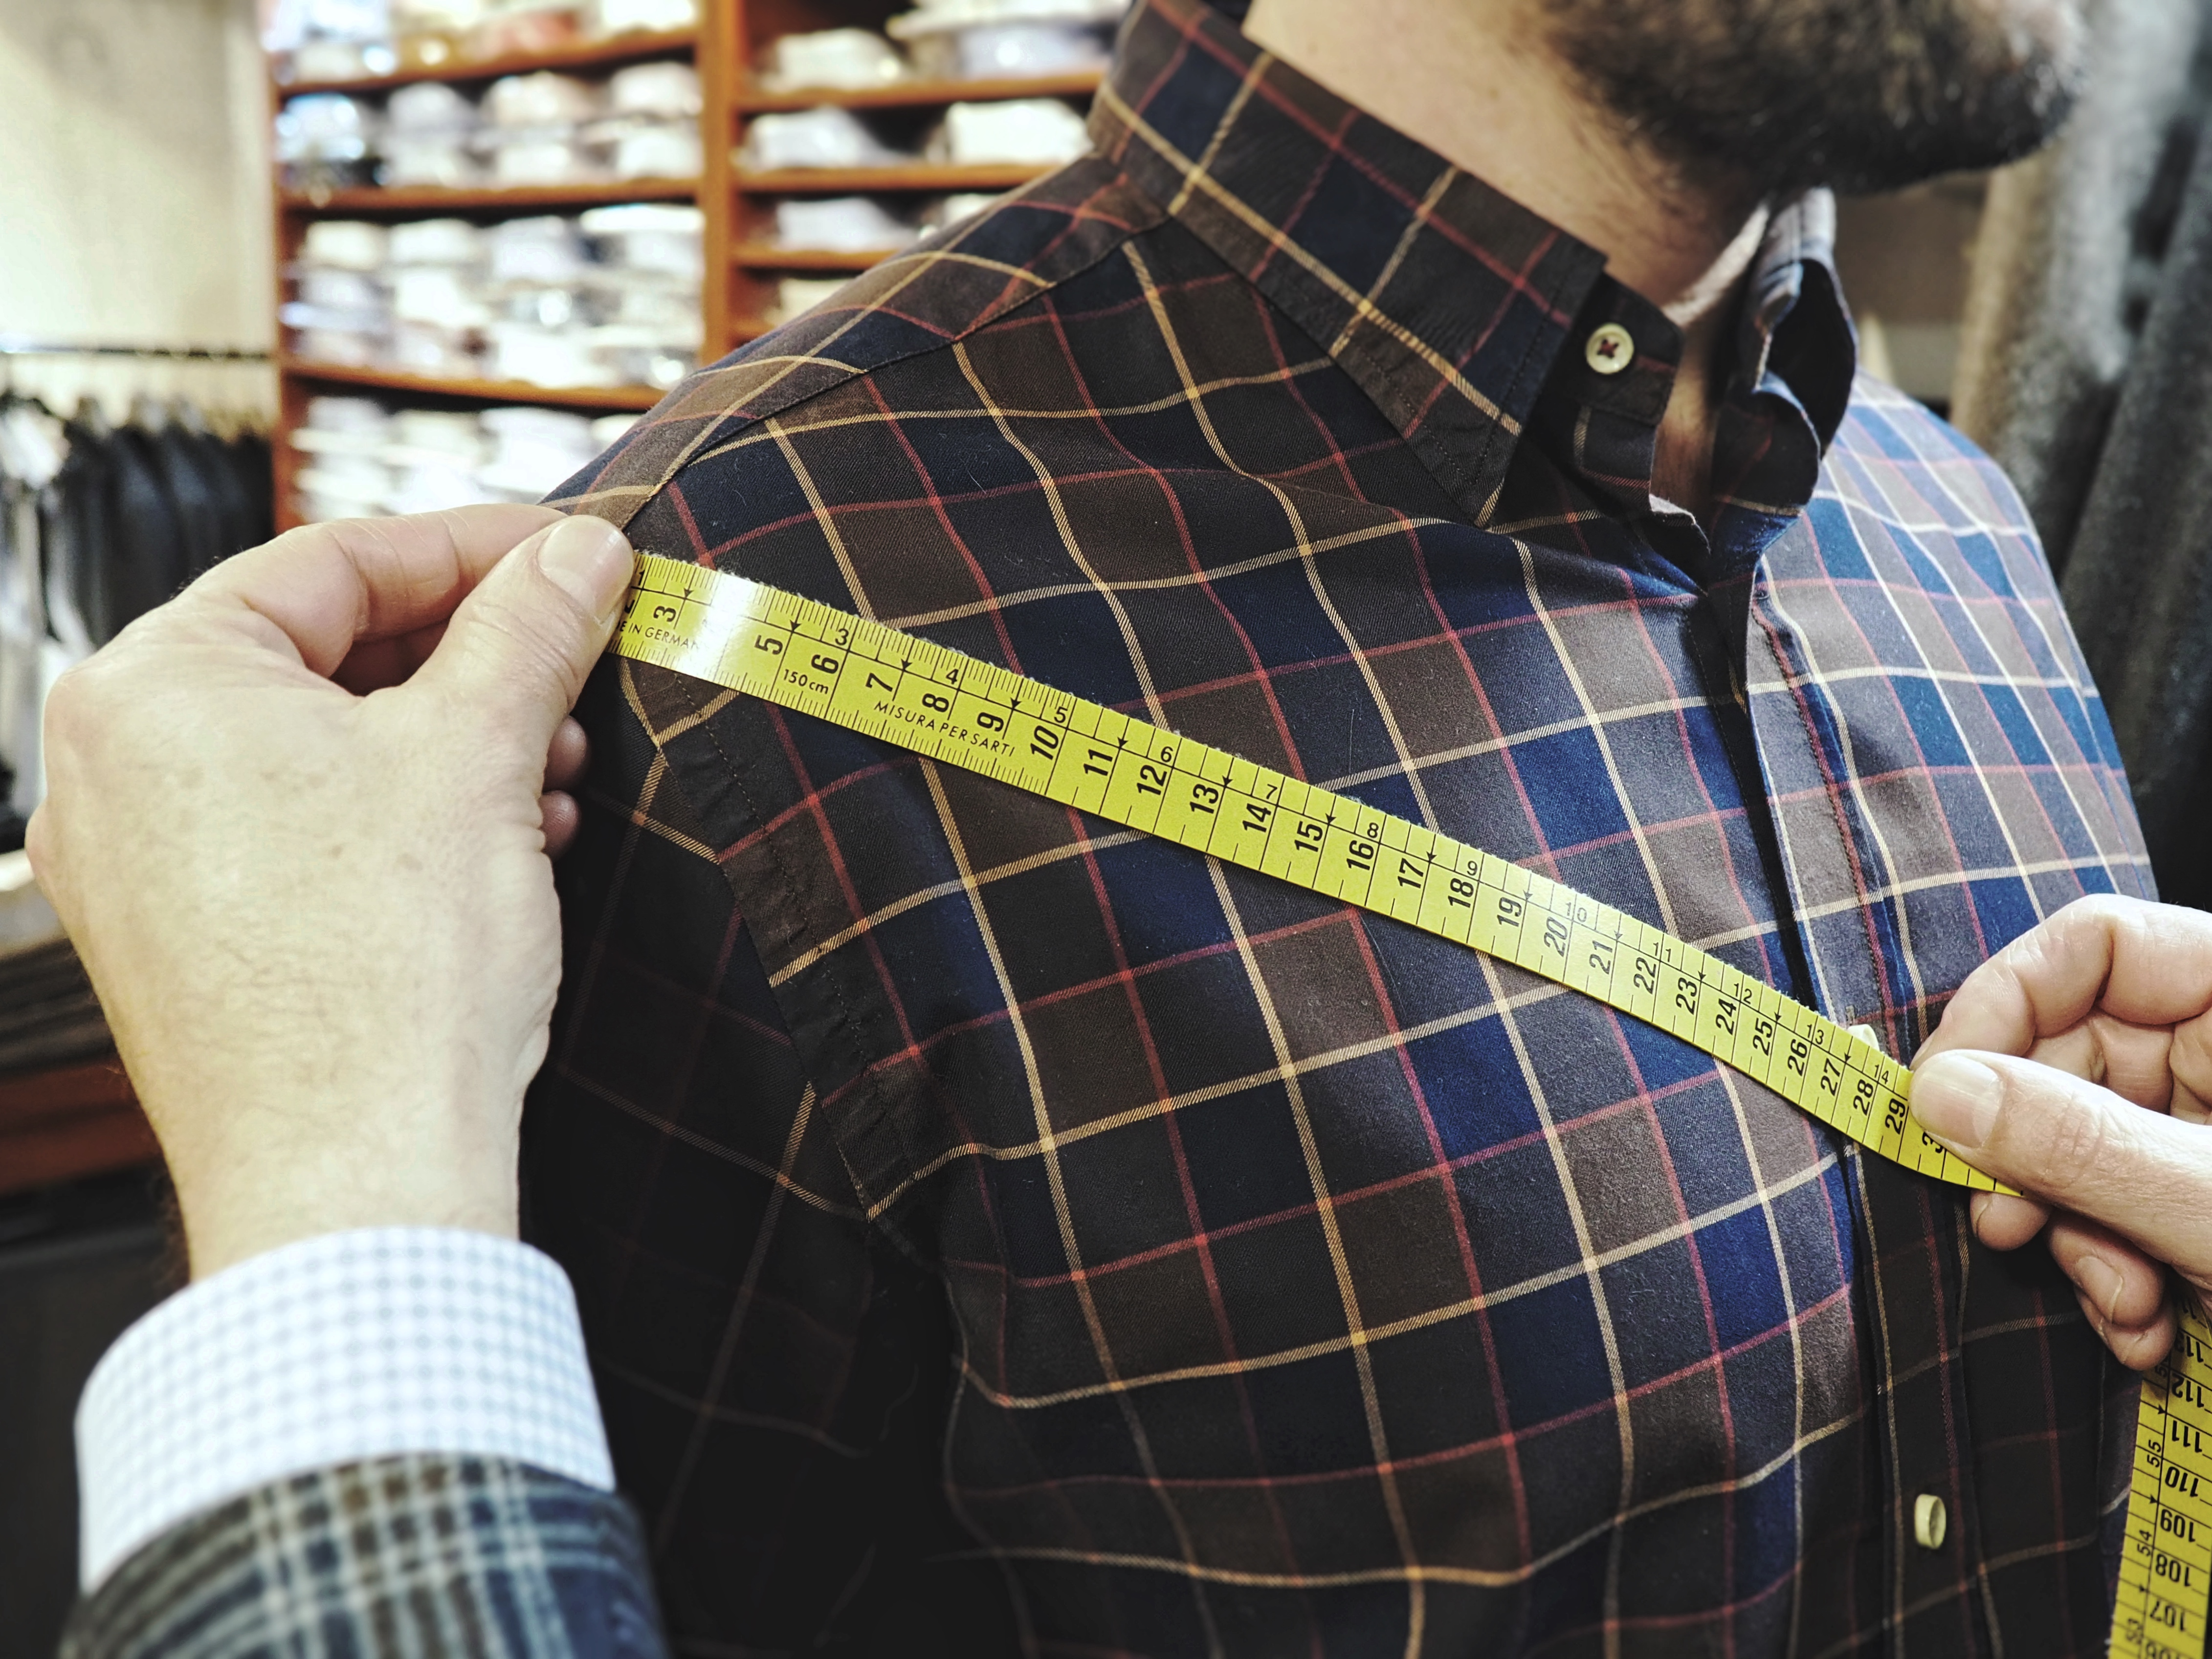 mides, camisa, moda, home, costura, artesanal, bespoke, mesurar, pit